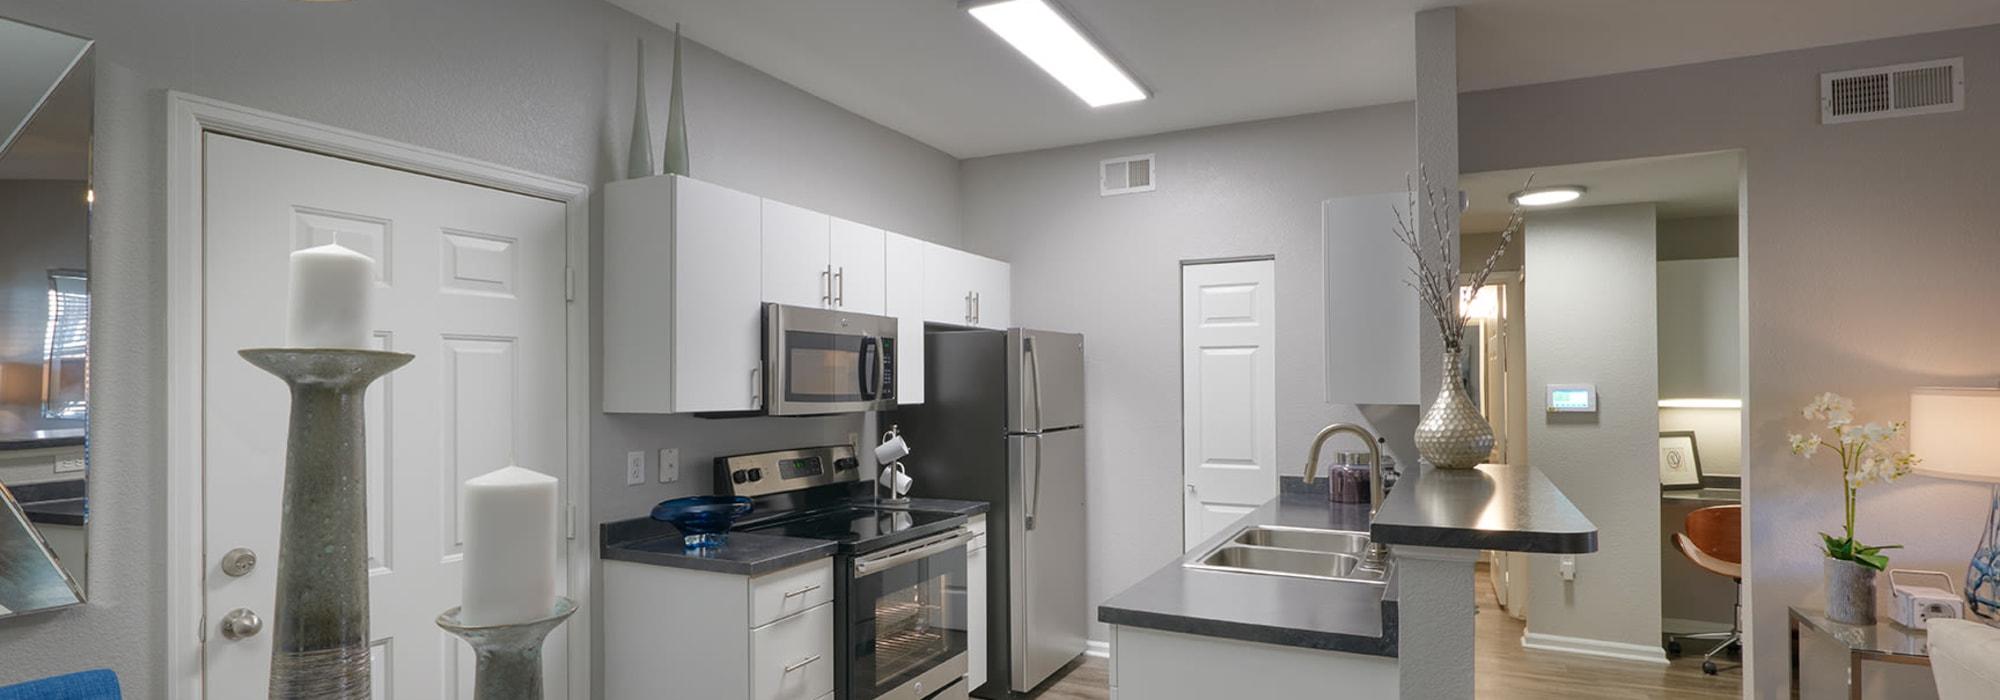 Privacy policy of Crestone Apartments in Aurora, Colorado